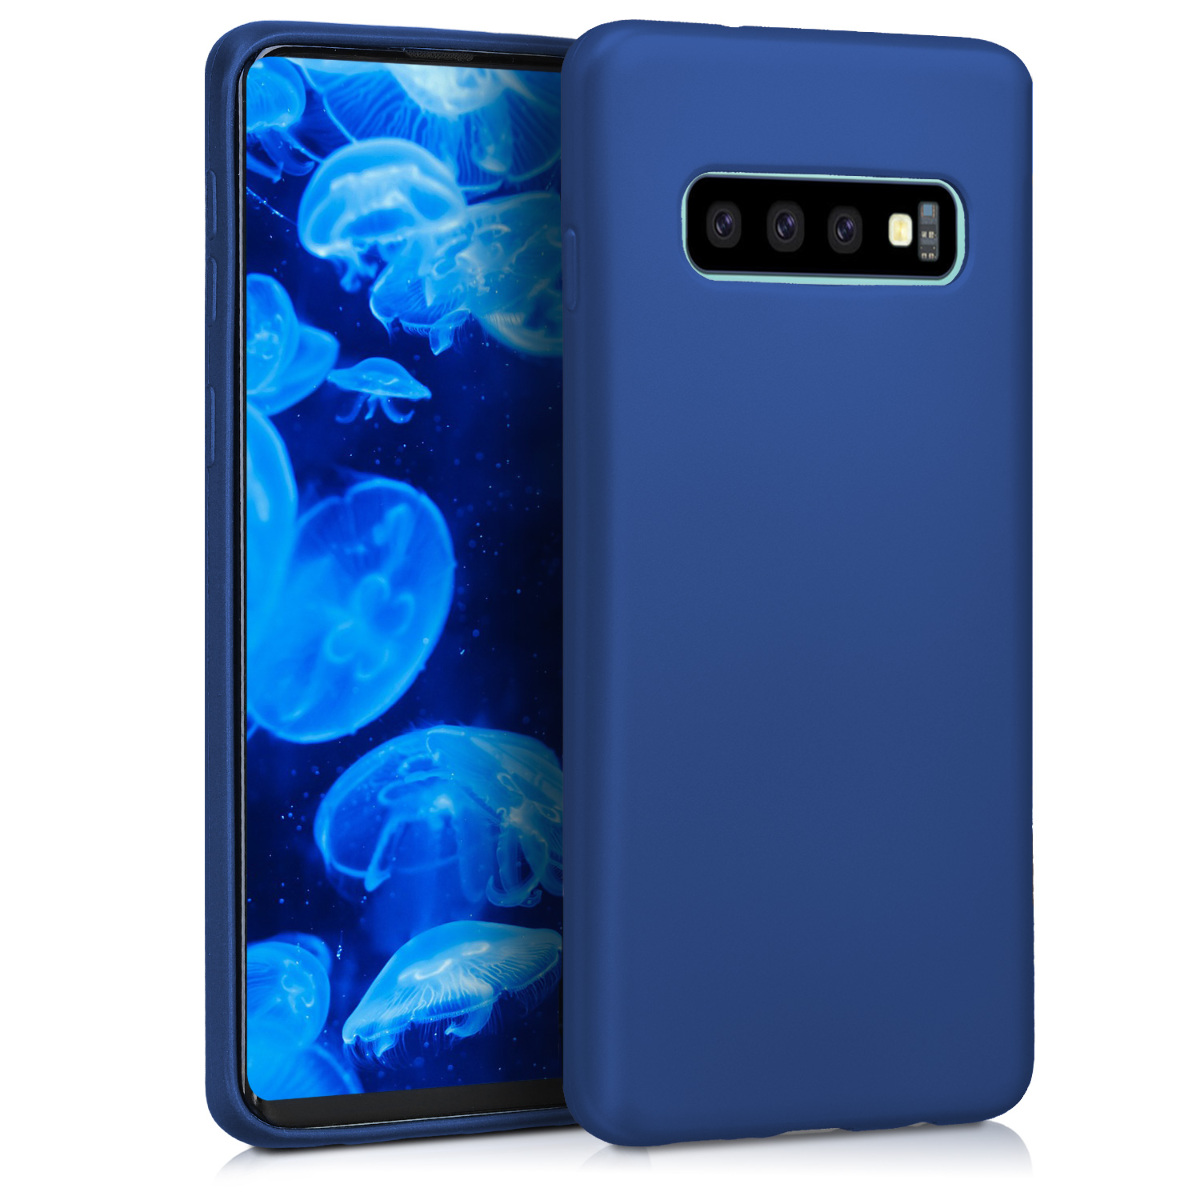 Silikonové pouzdro / obal for Samsung Galaxy S10 - Soft